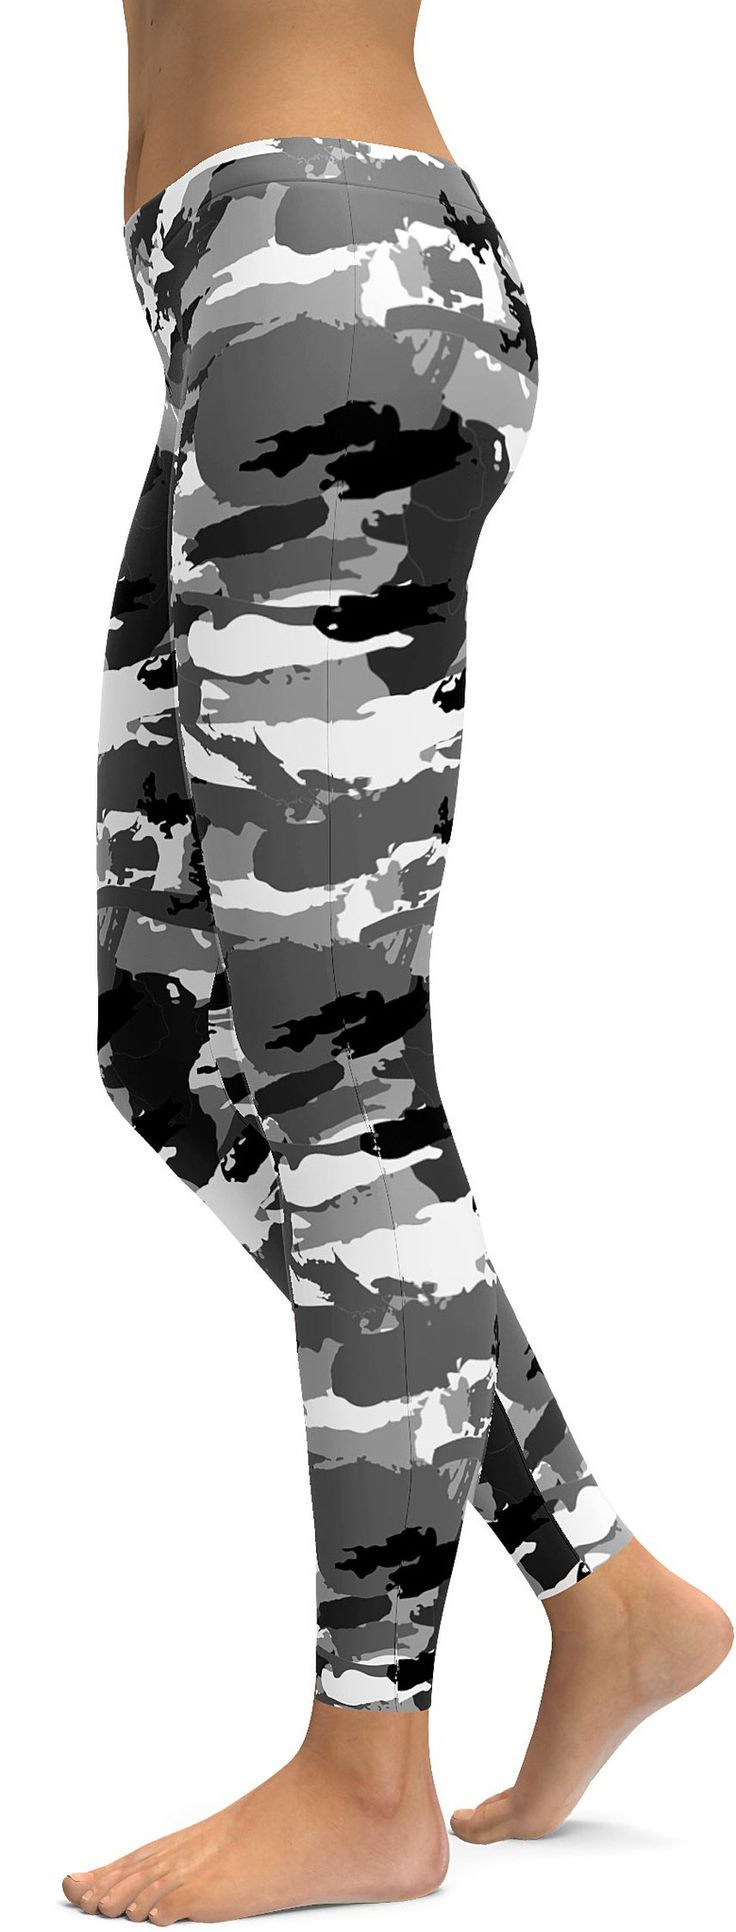 Black & White Camo Leggings - GearBunch Leggings / Yoga Pants